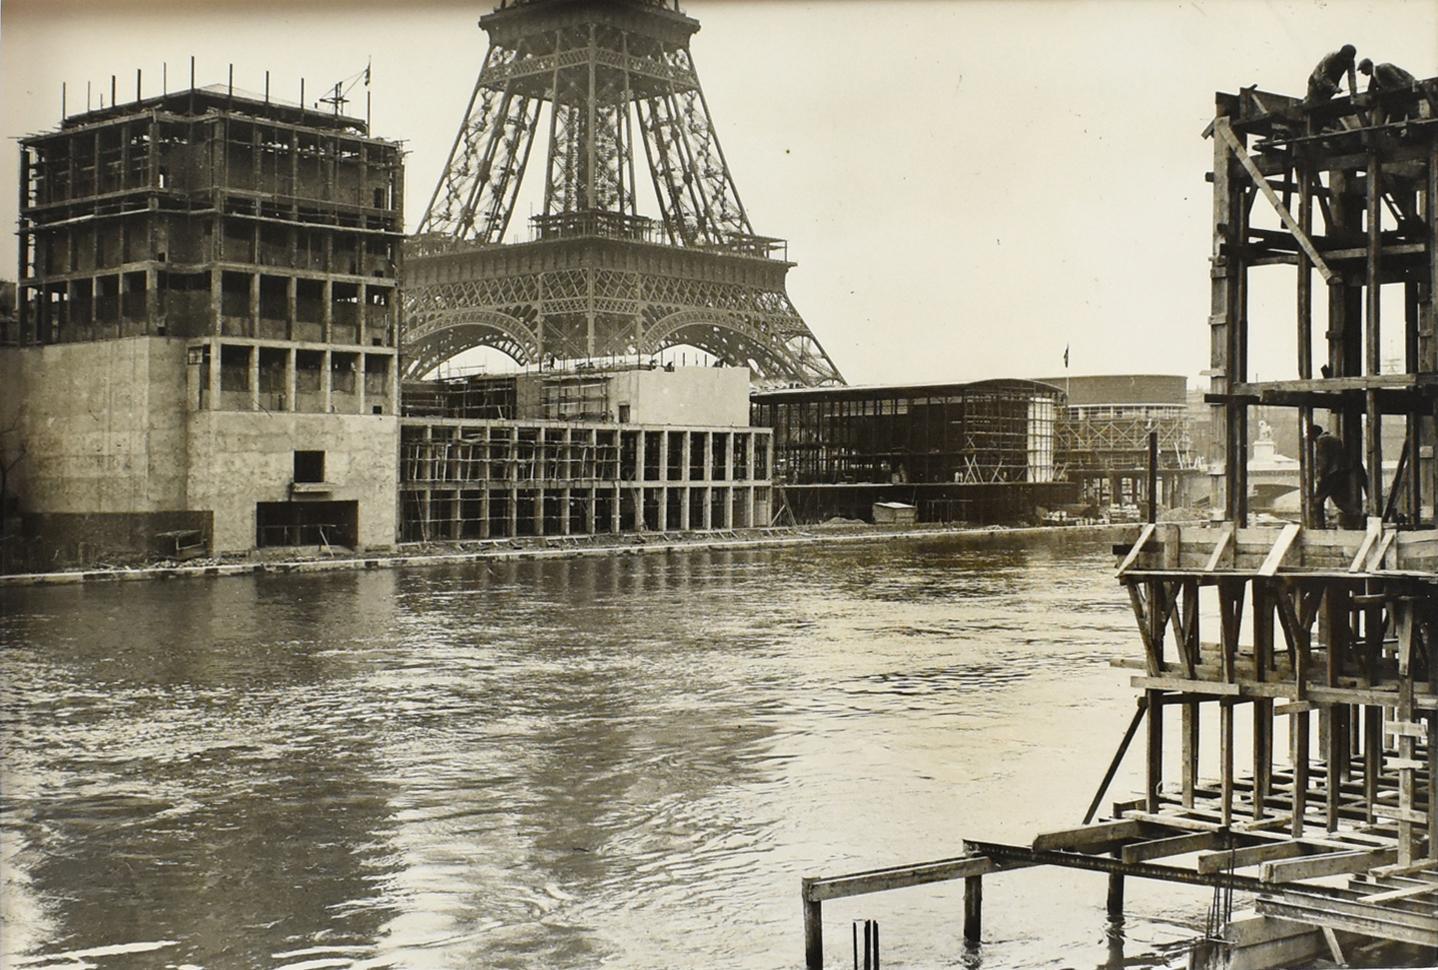 Paris International Exhibition w Eiffel Tower  - Silver Gelatin B & W Photograph